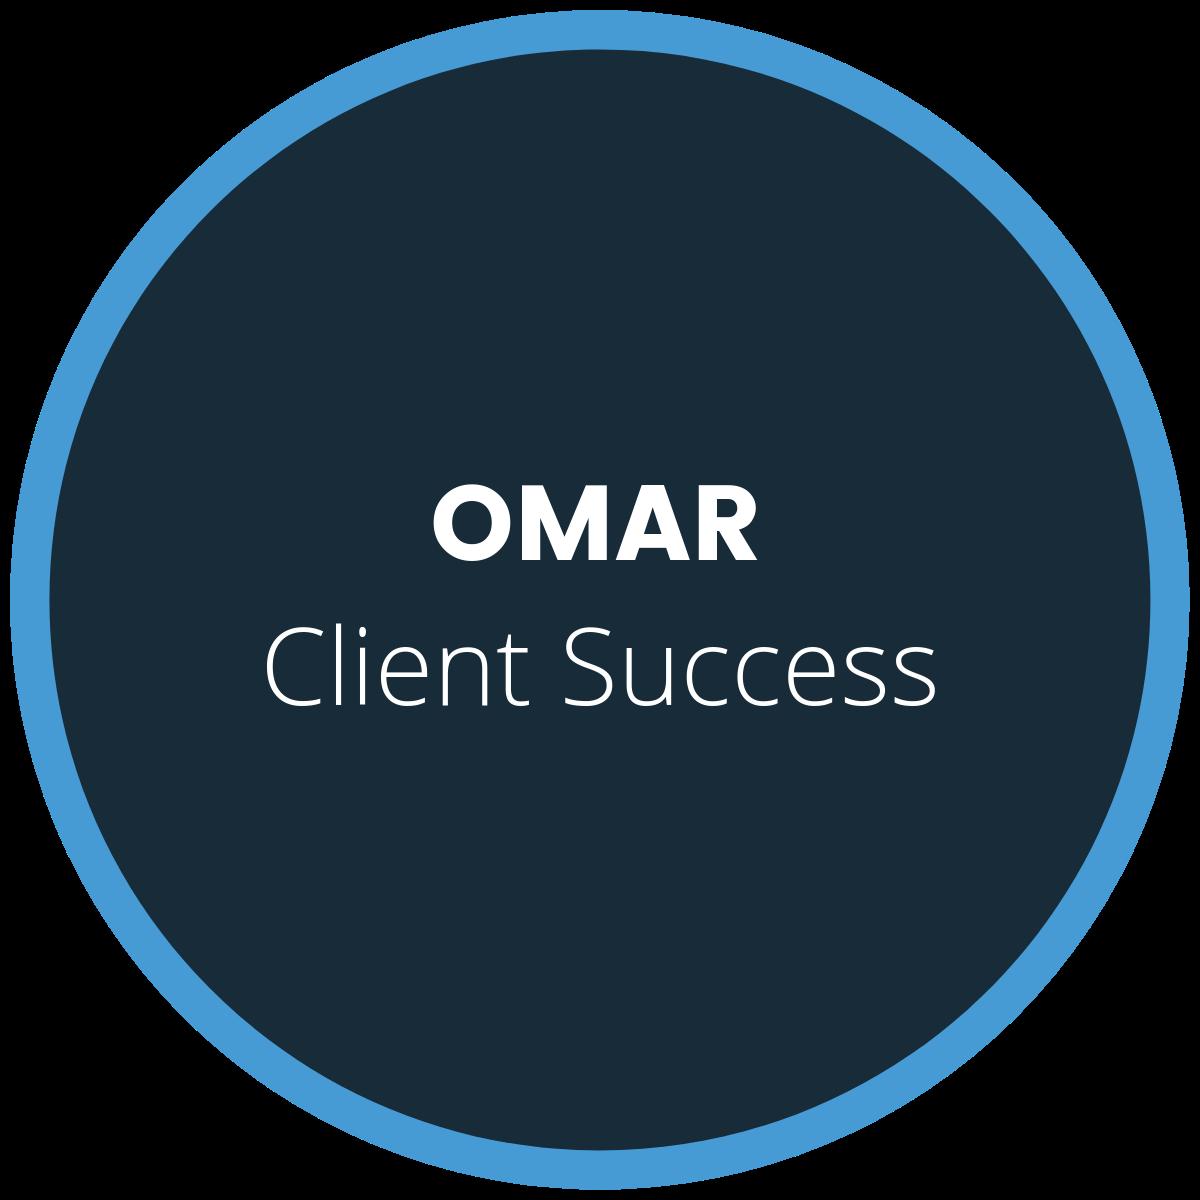 omar-web4realty